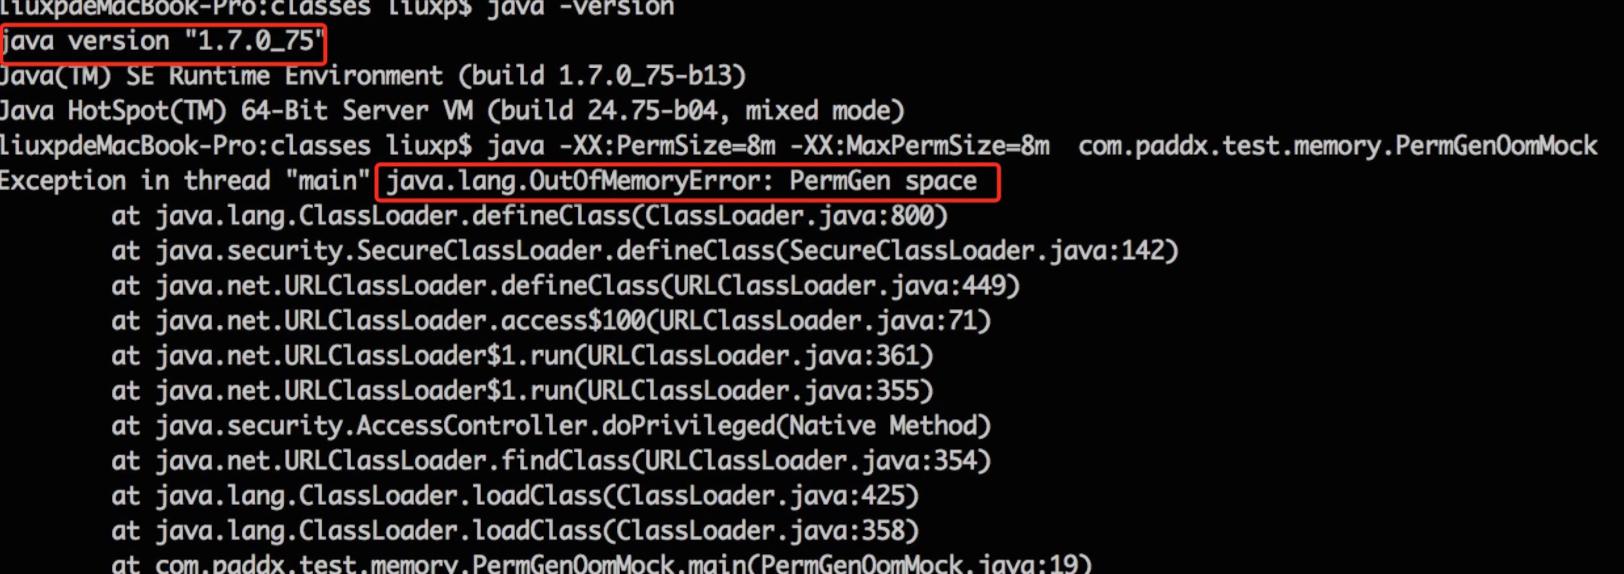 Java内存模型-永久代PermGen和元空间Metaspace